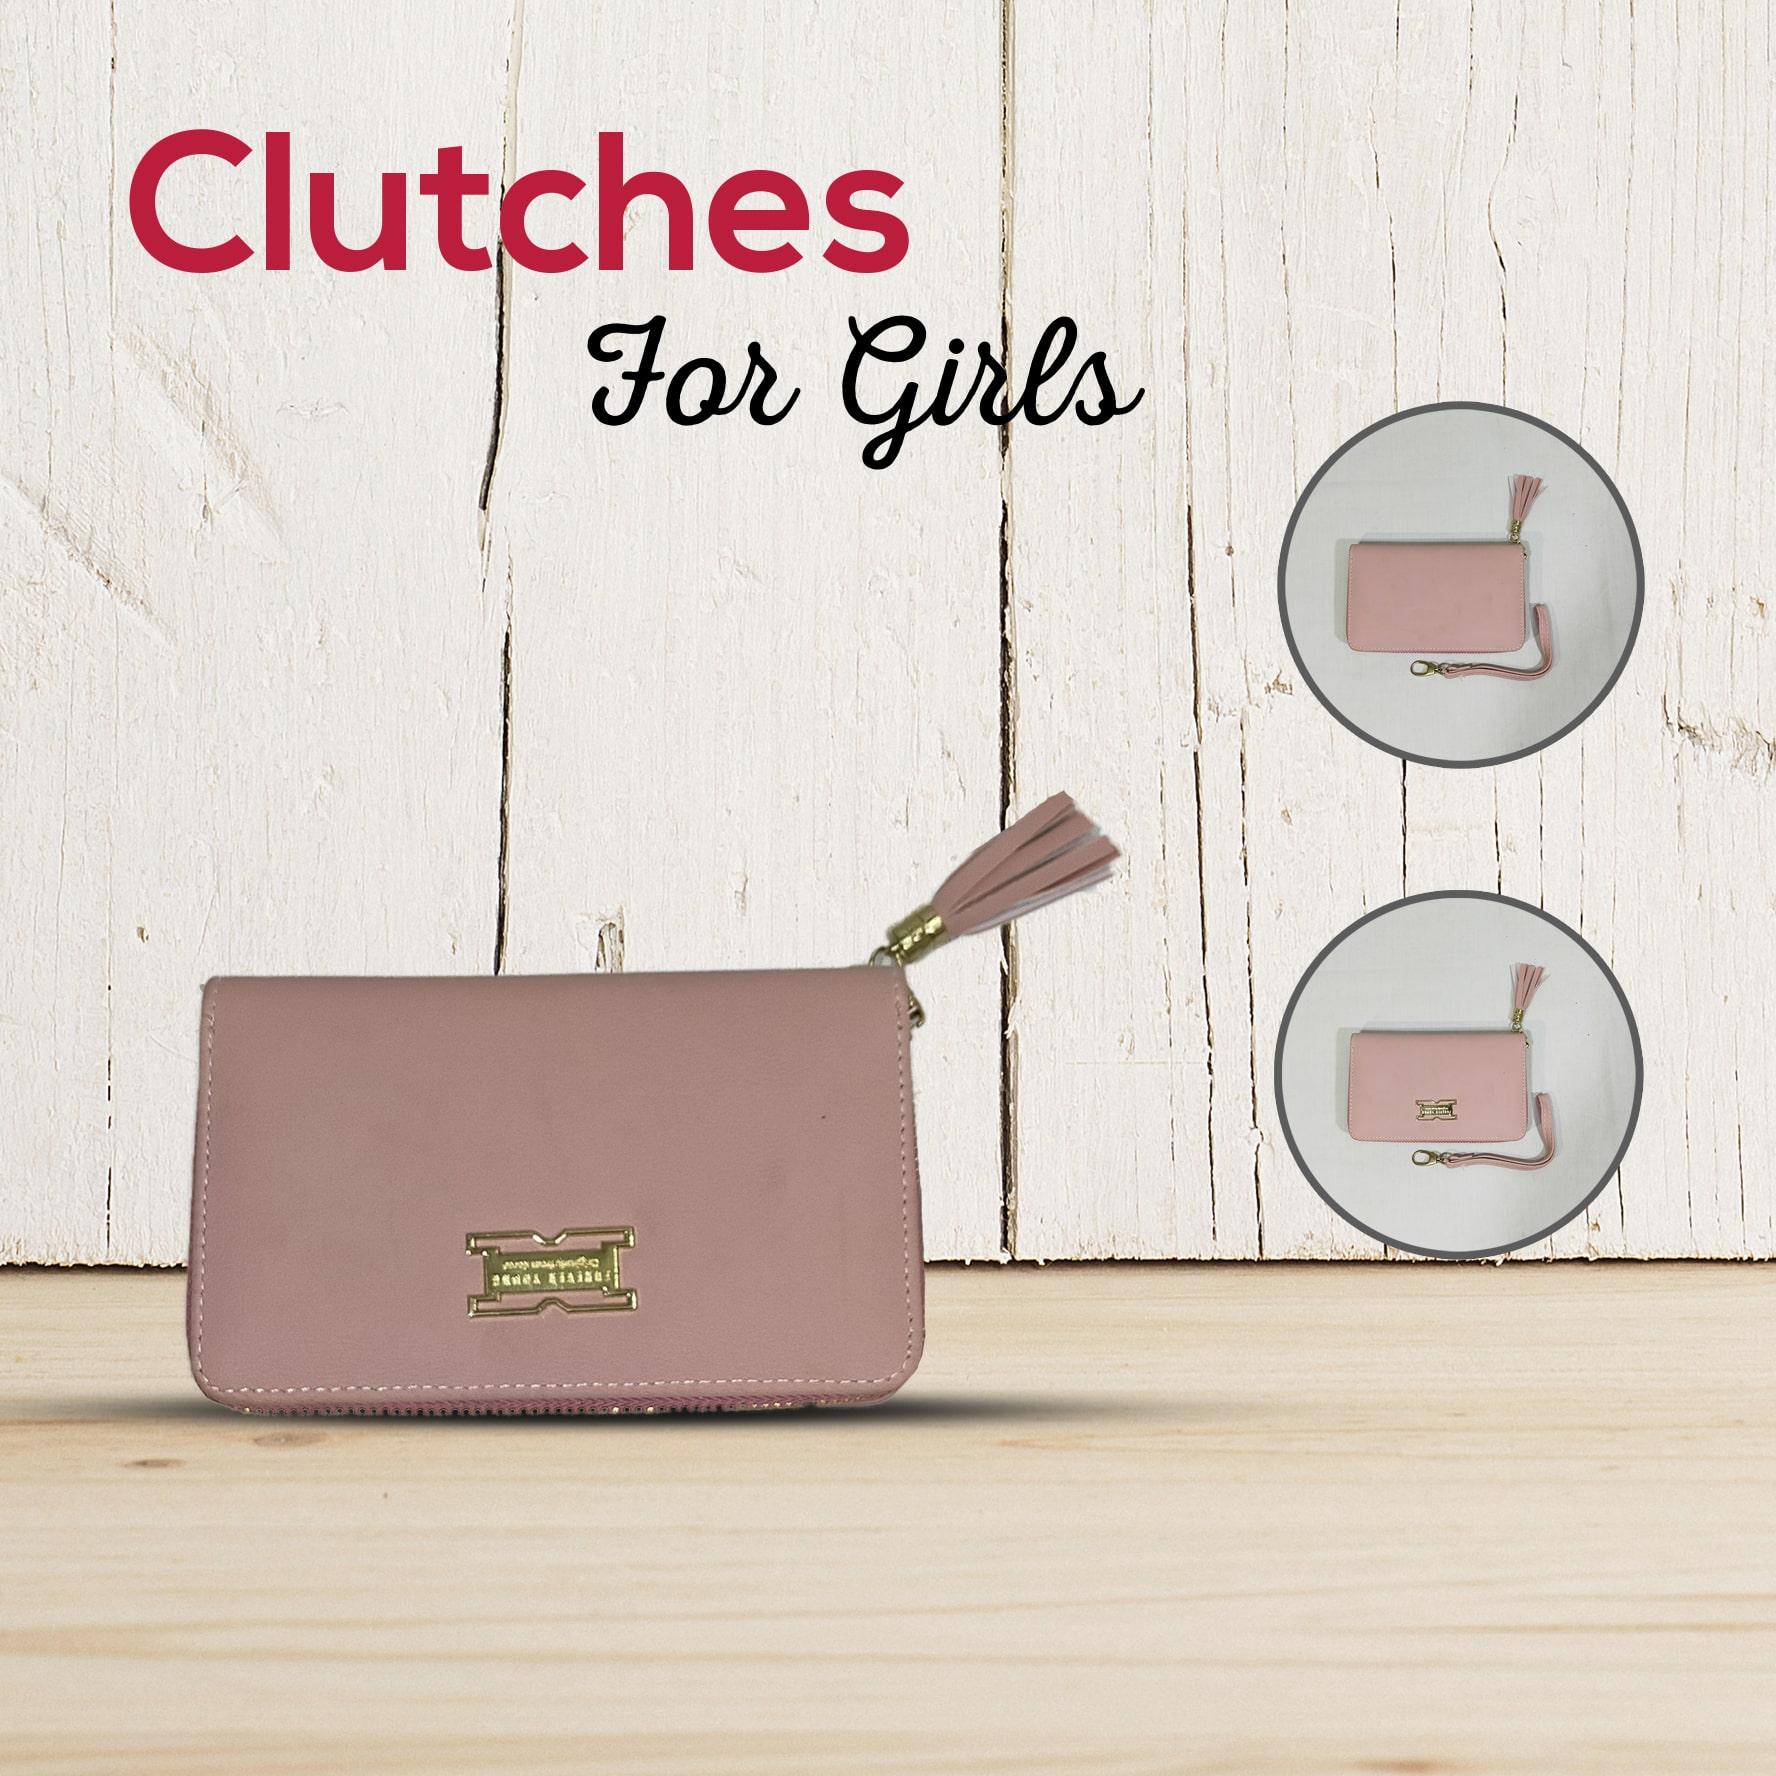 Ladies Hand Clutch - Zipper Style Purse Clutch